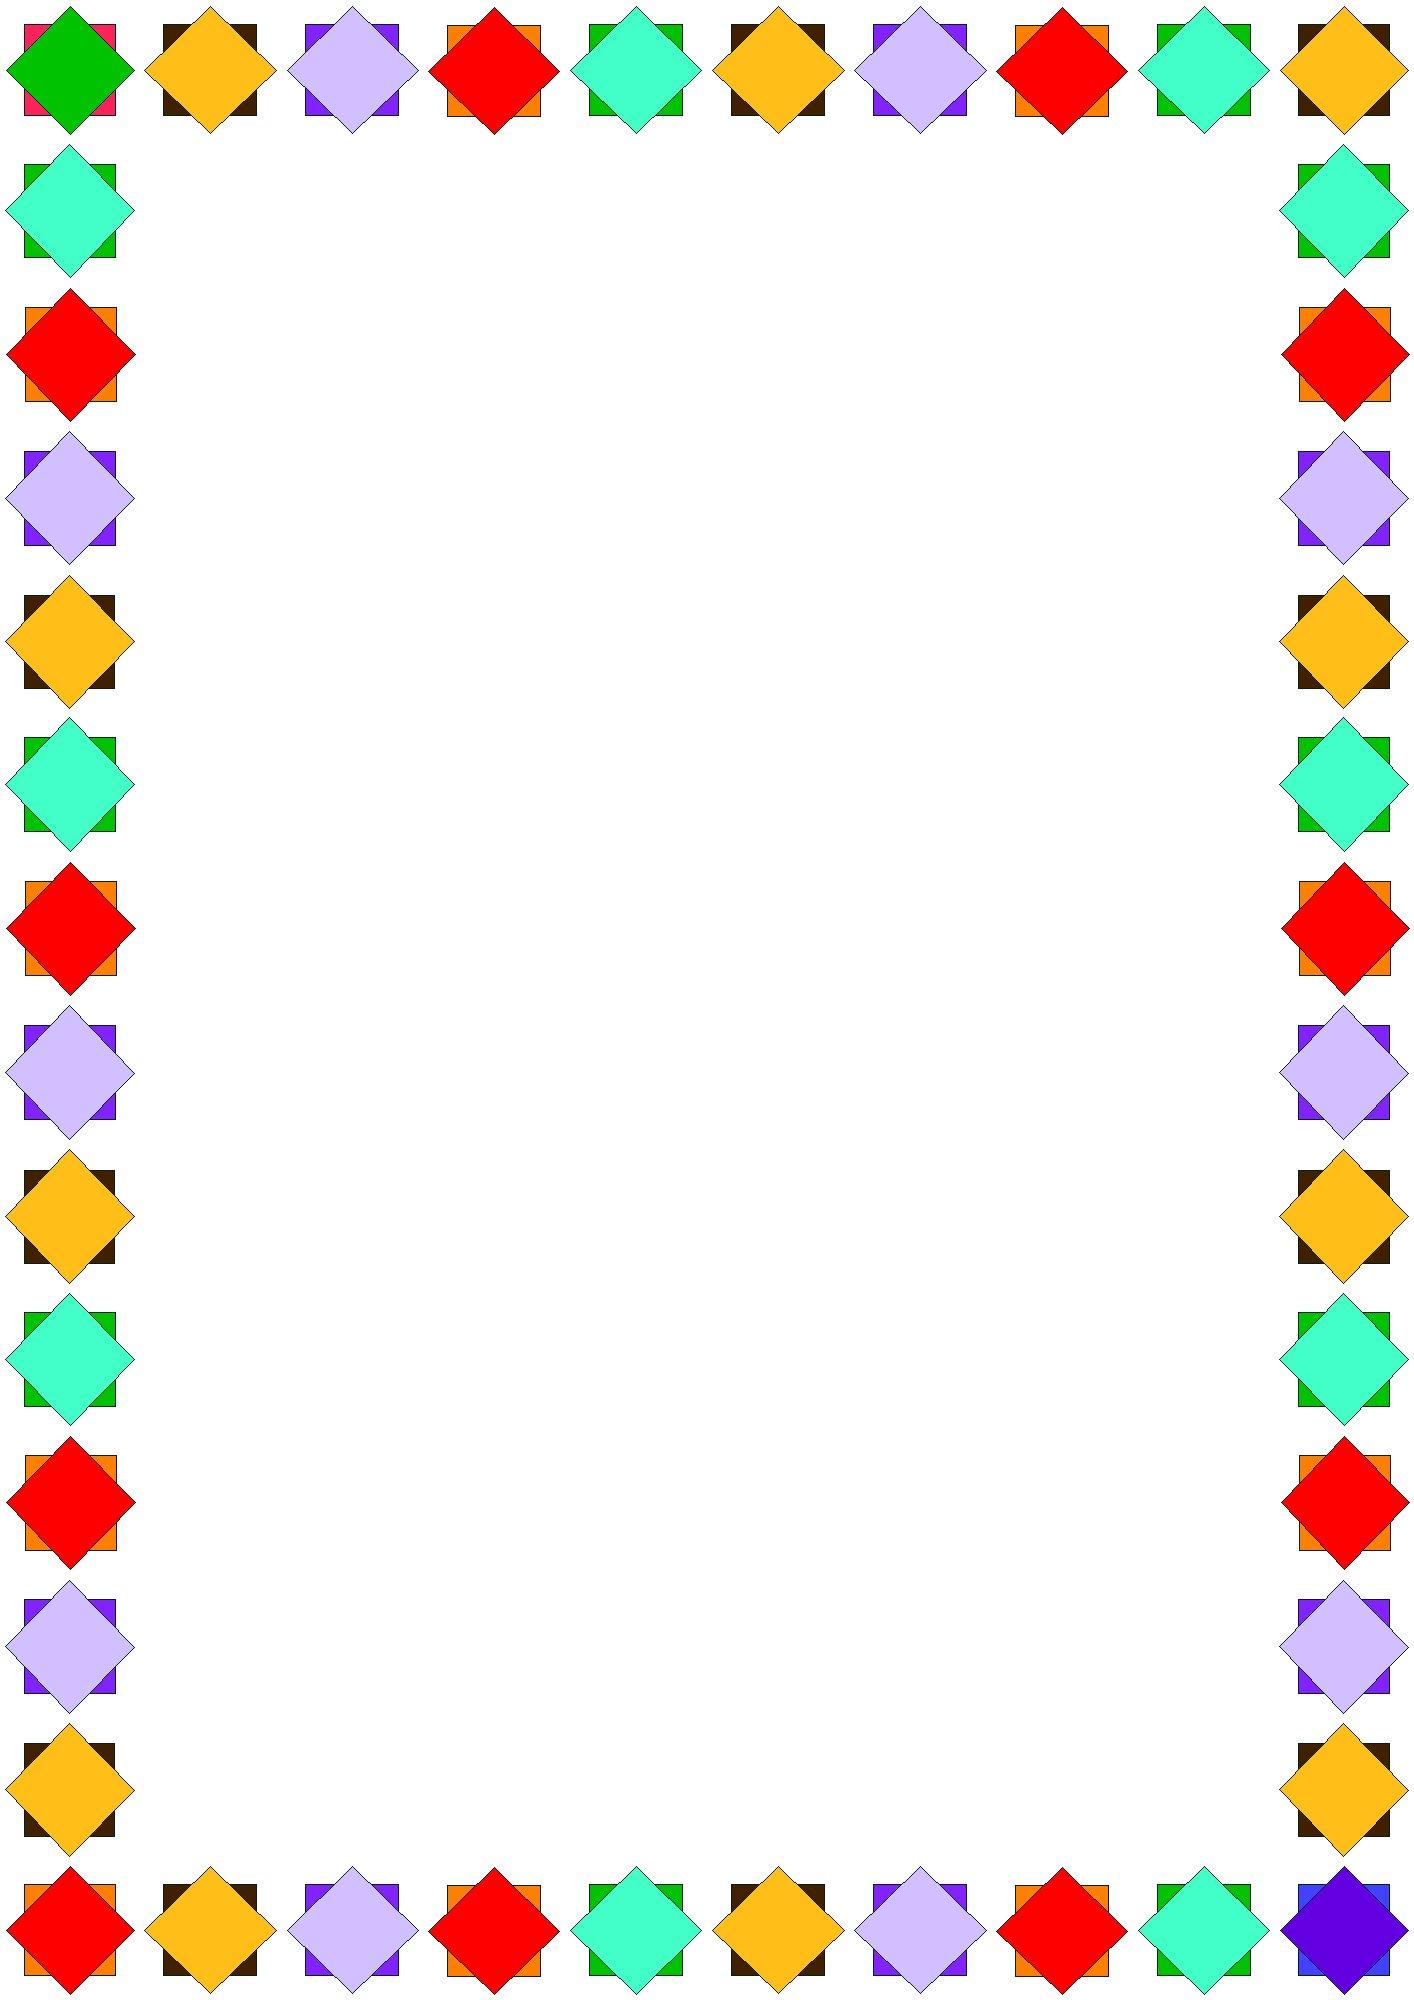 Preschool Border Clip Art - ClipArt Best